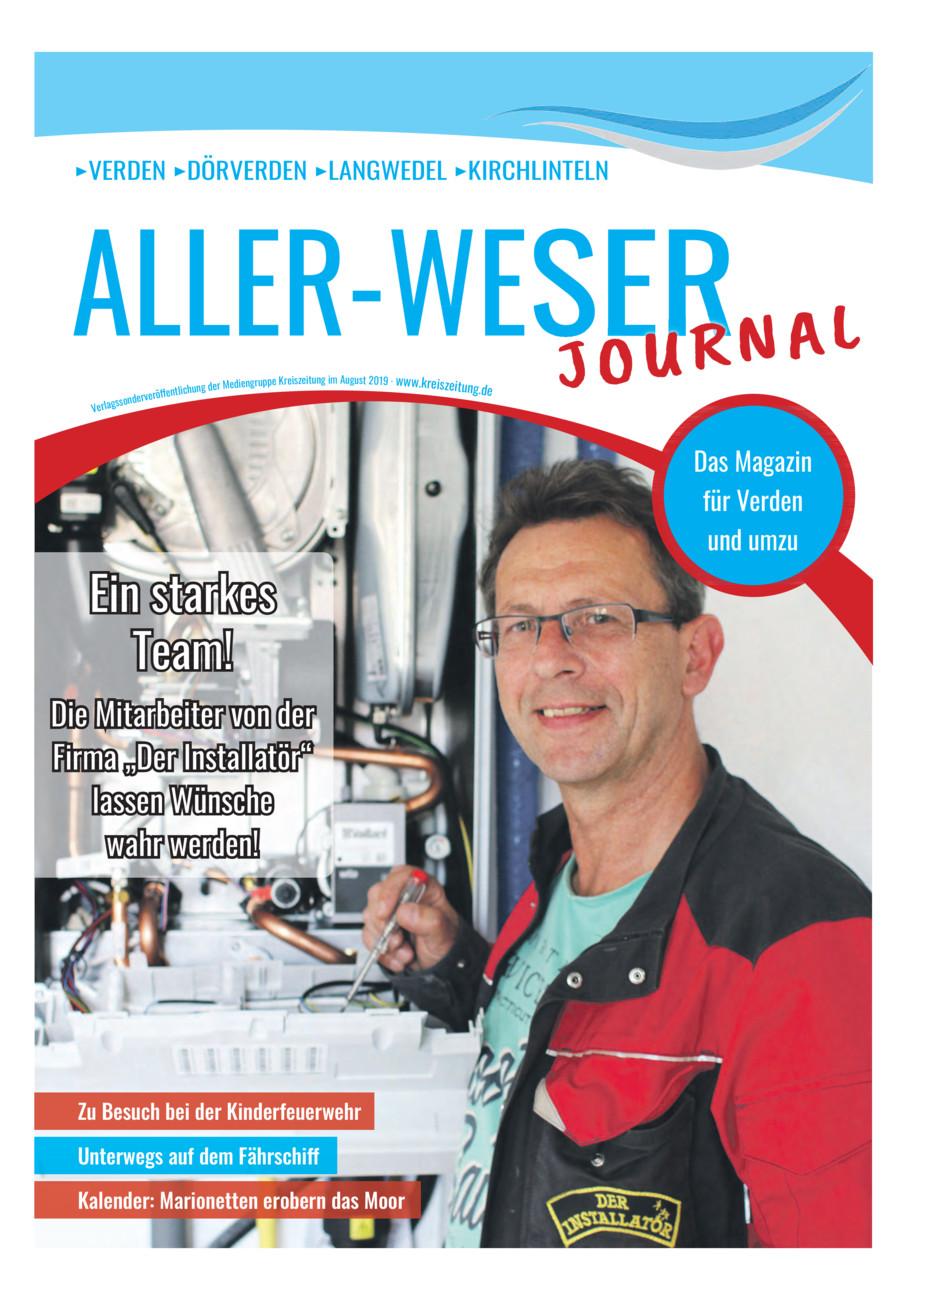 Aller-Weser-Journal vom Freitag, 23.08.2019